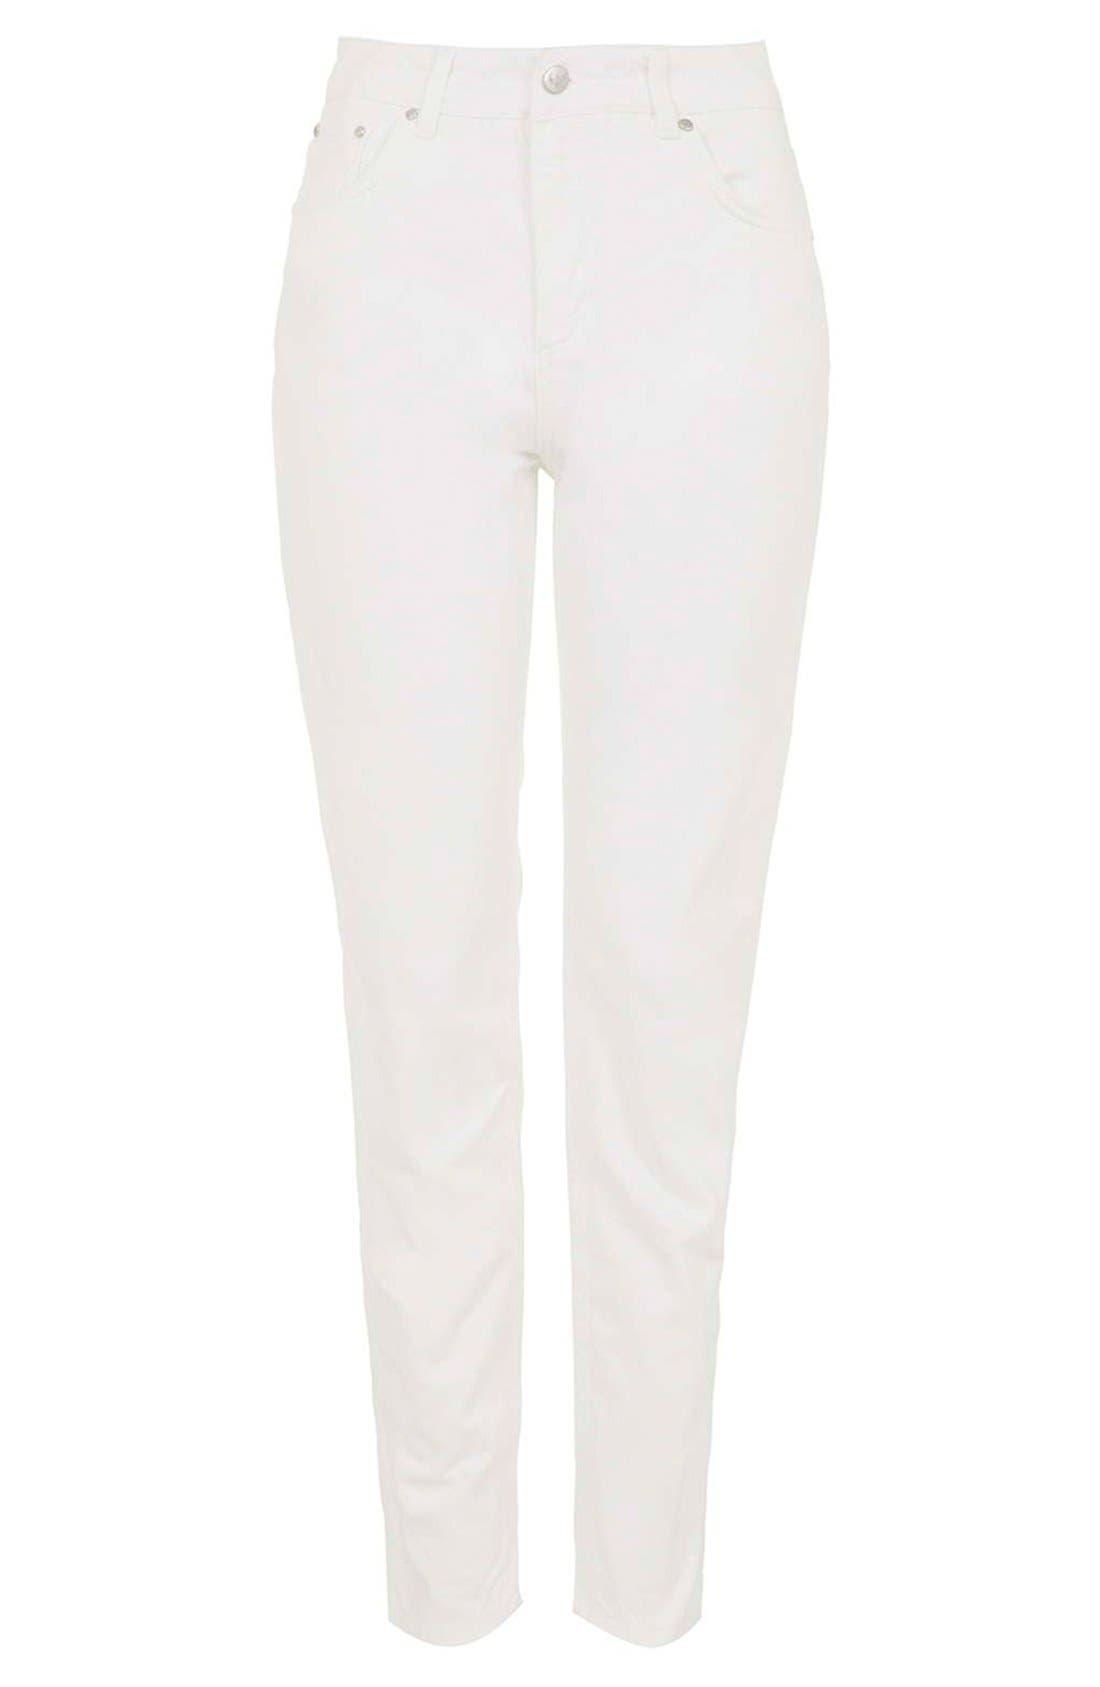 Alternate Image 3  - Topshop Boutique Slim Leg Jeans (Cream)